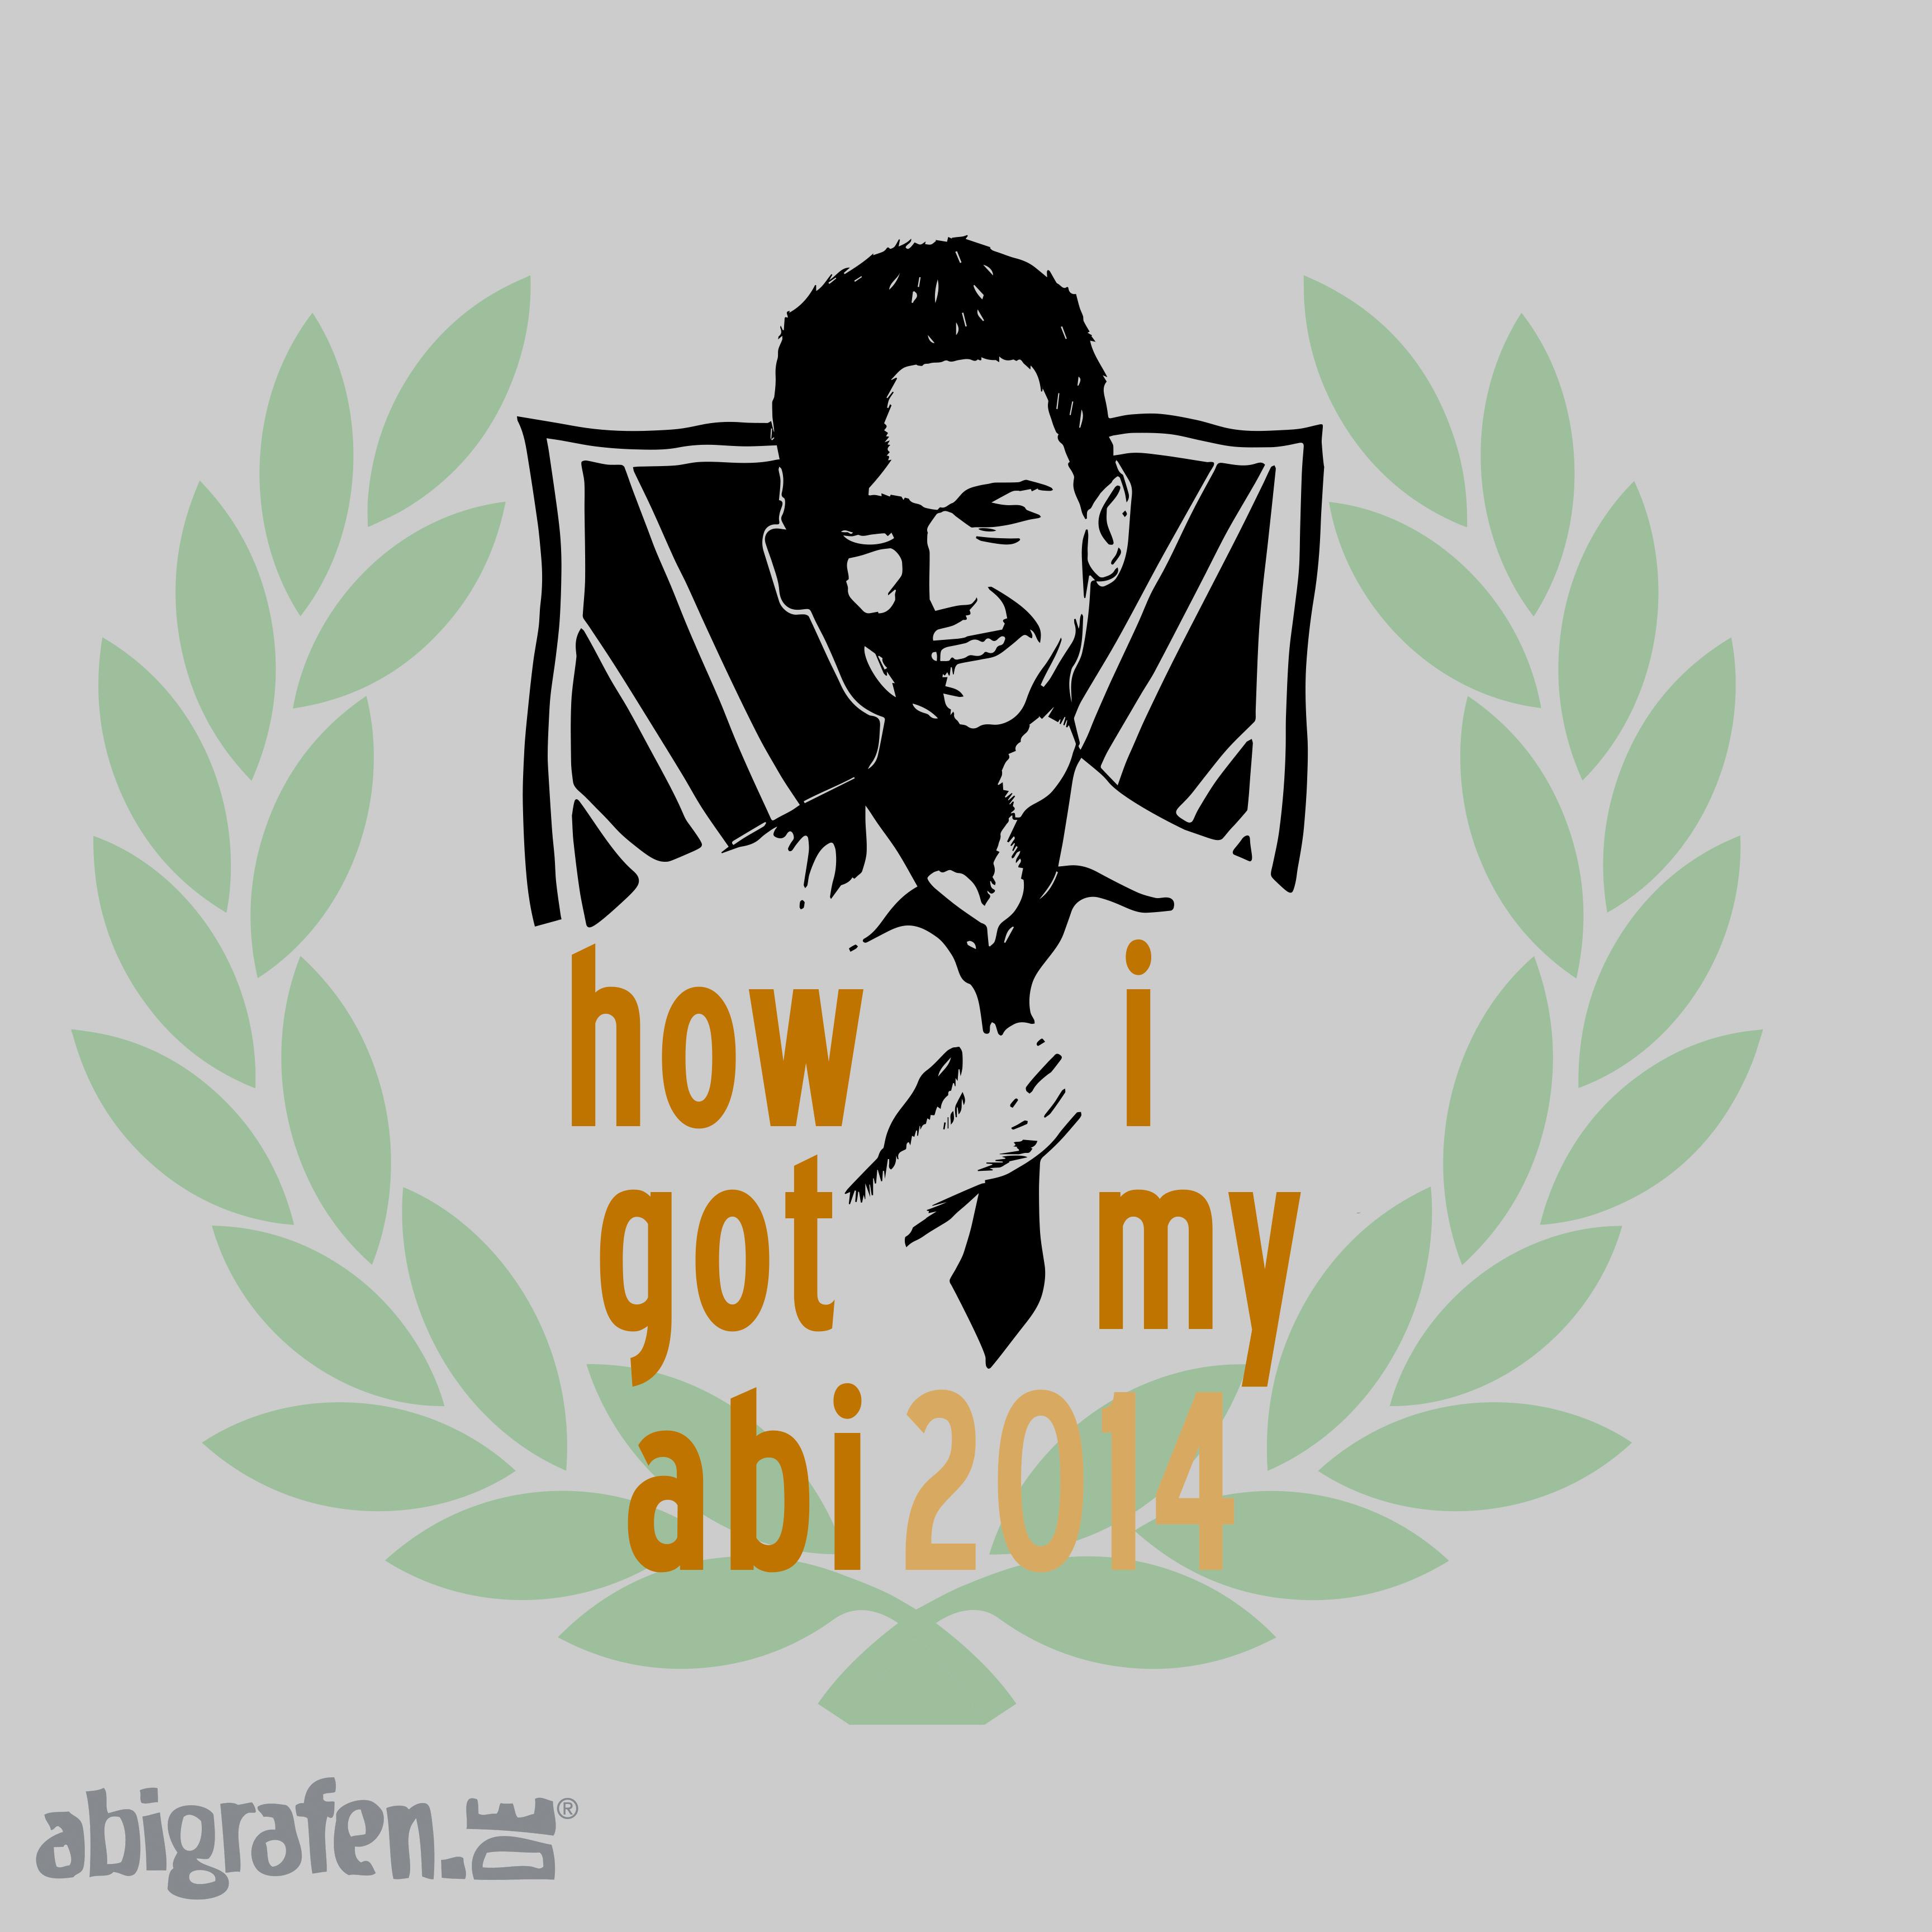 how i got my abi-1